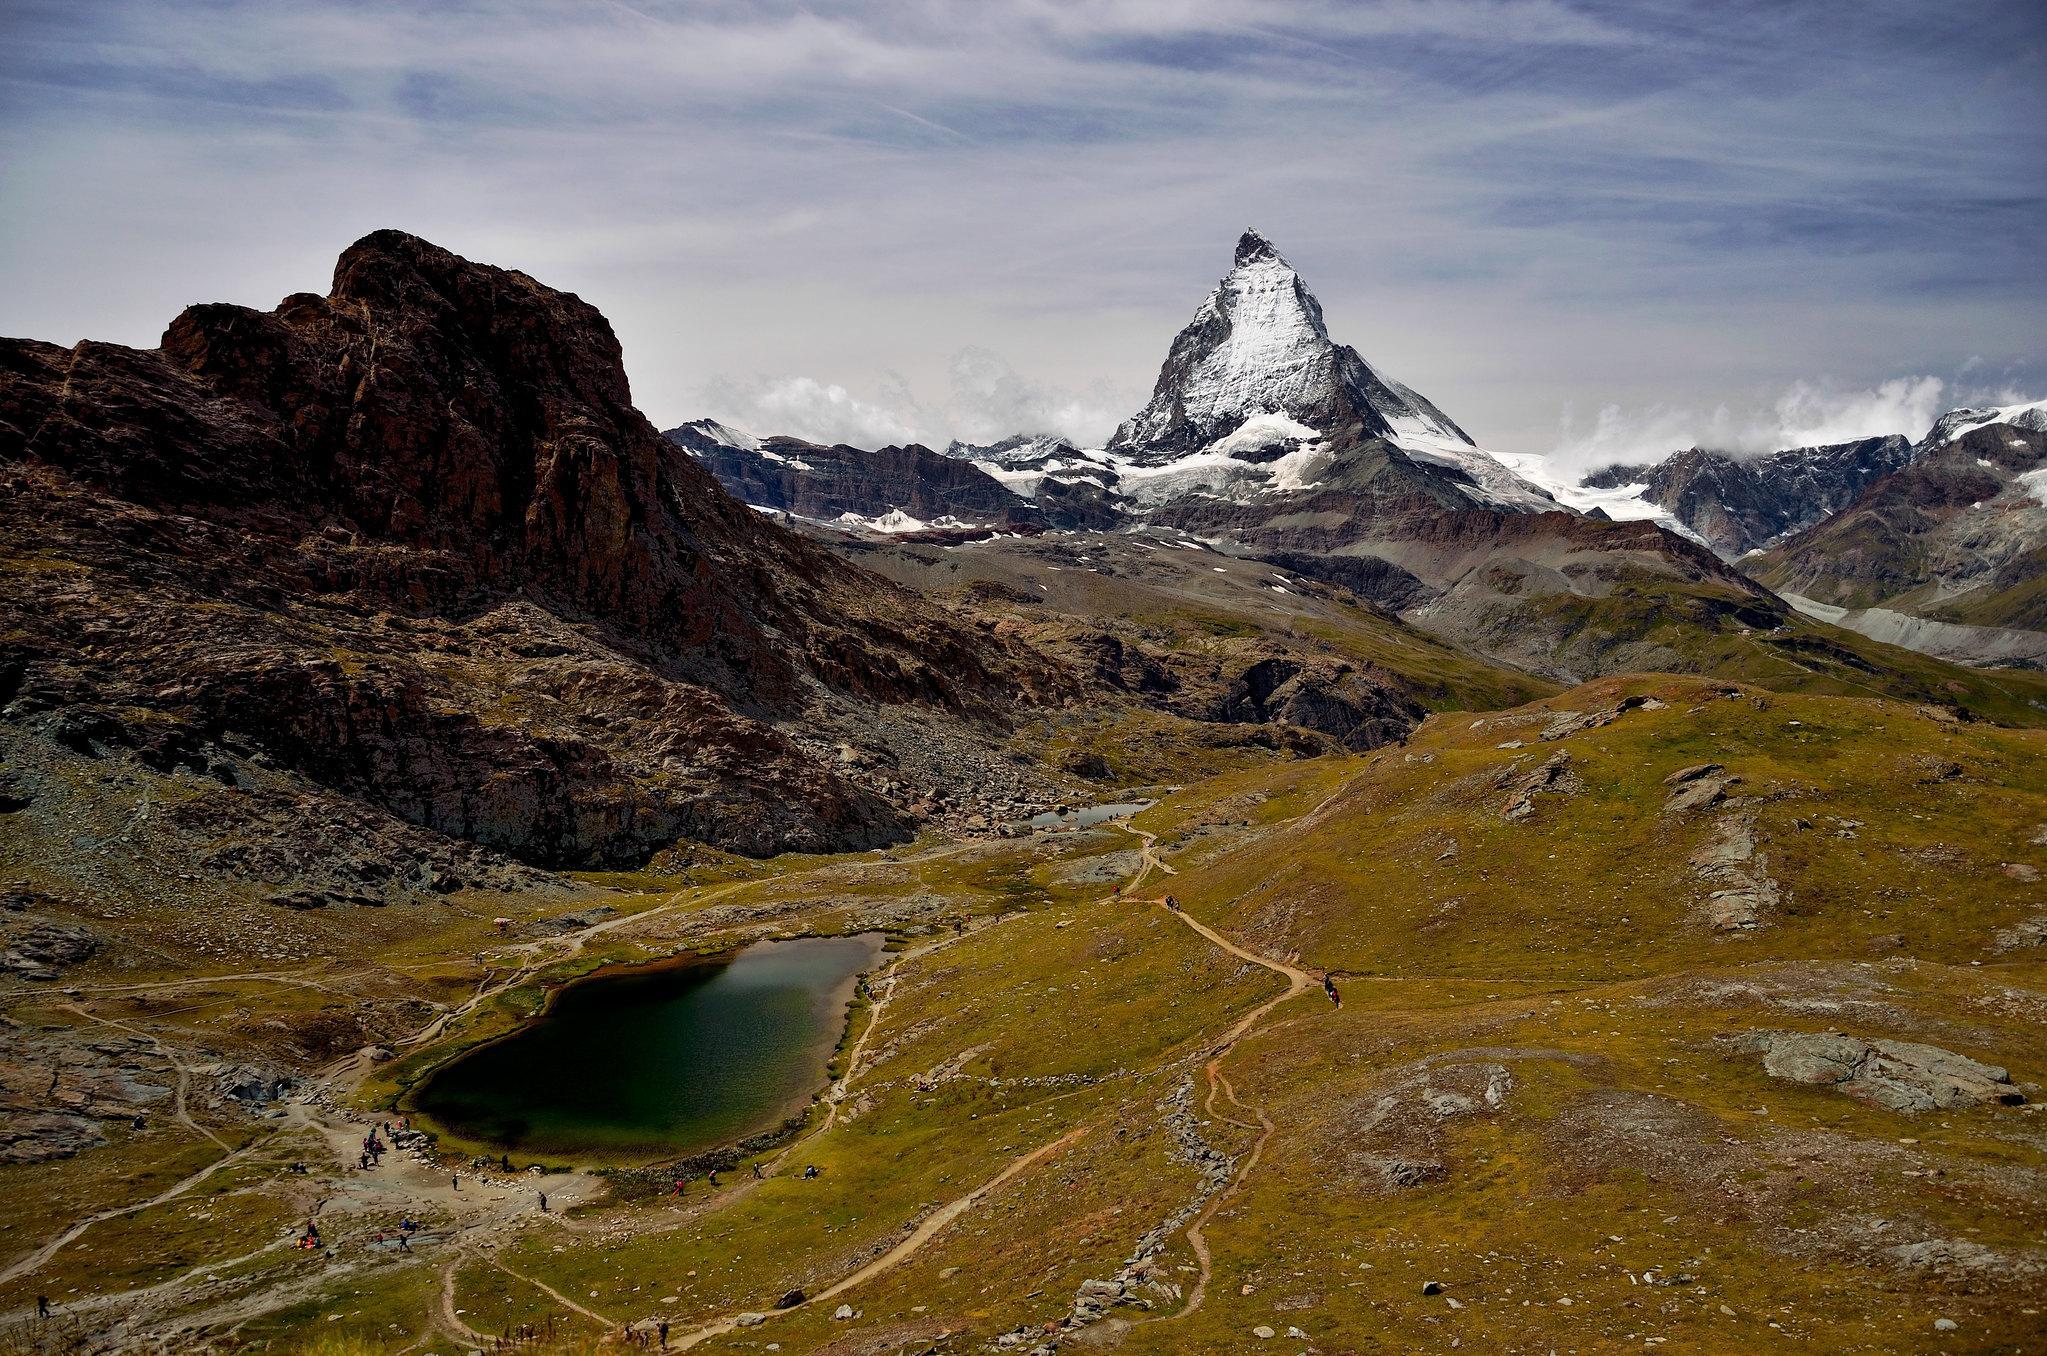 Zermatt, for The Omnia commercial feature